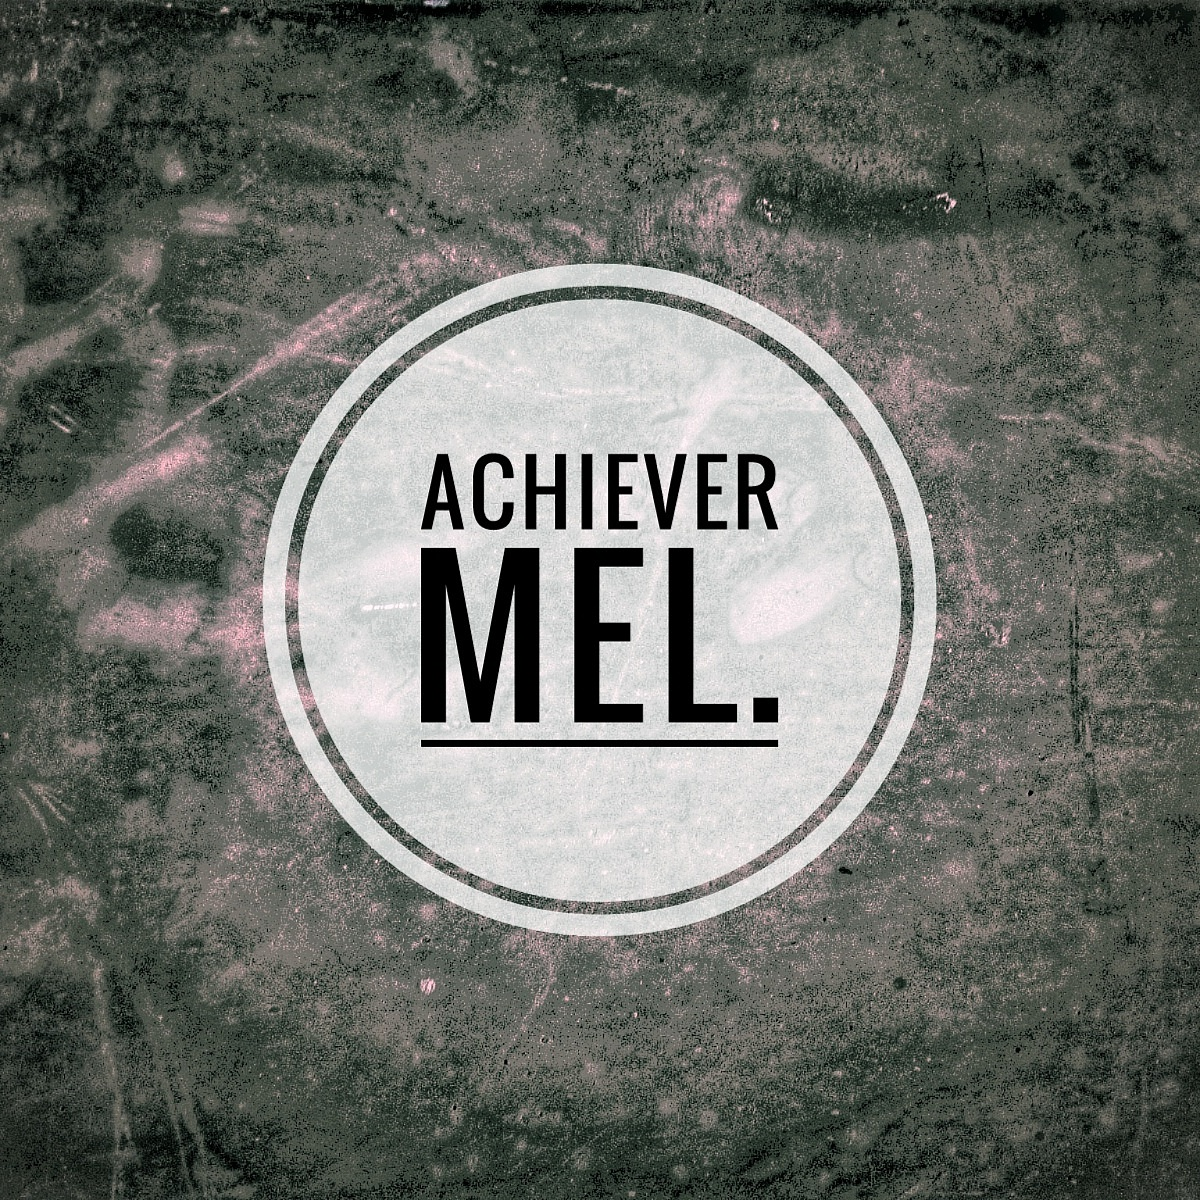 Achiever Mel